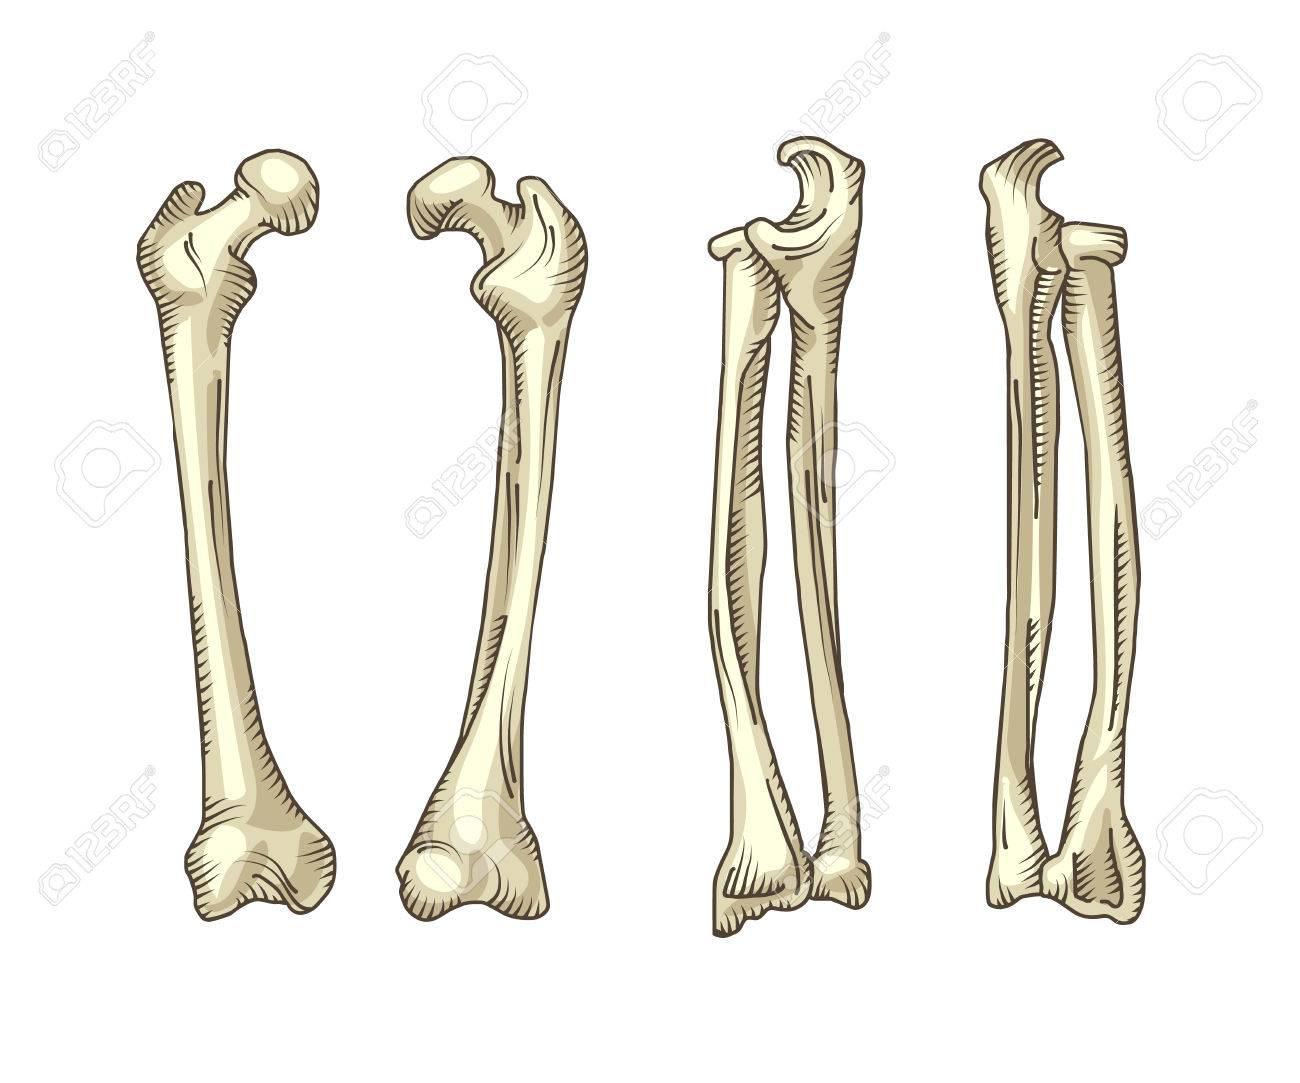 Hand Drawn Realistic Human Bones Vector Illustration Isolated